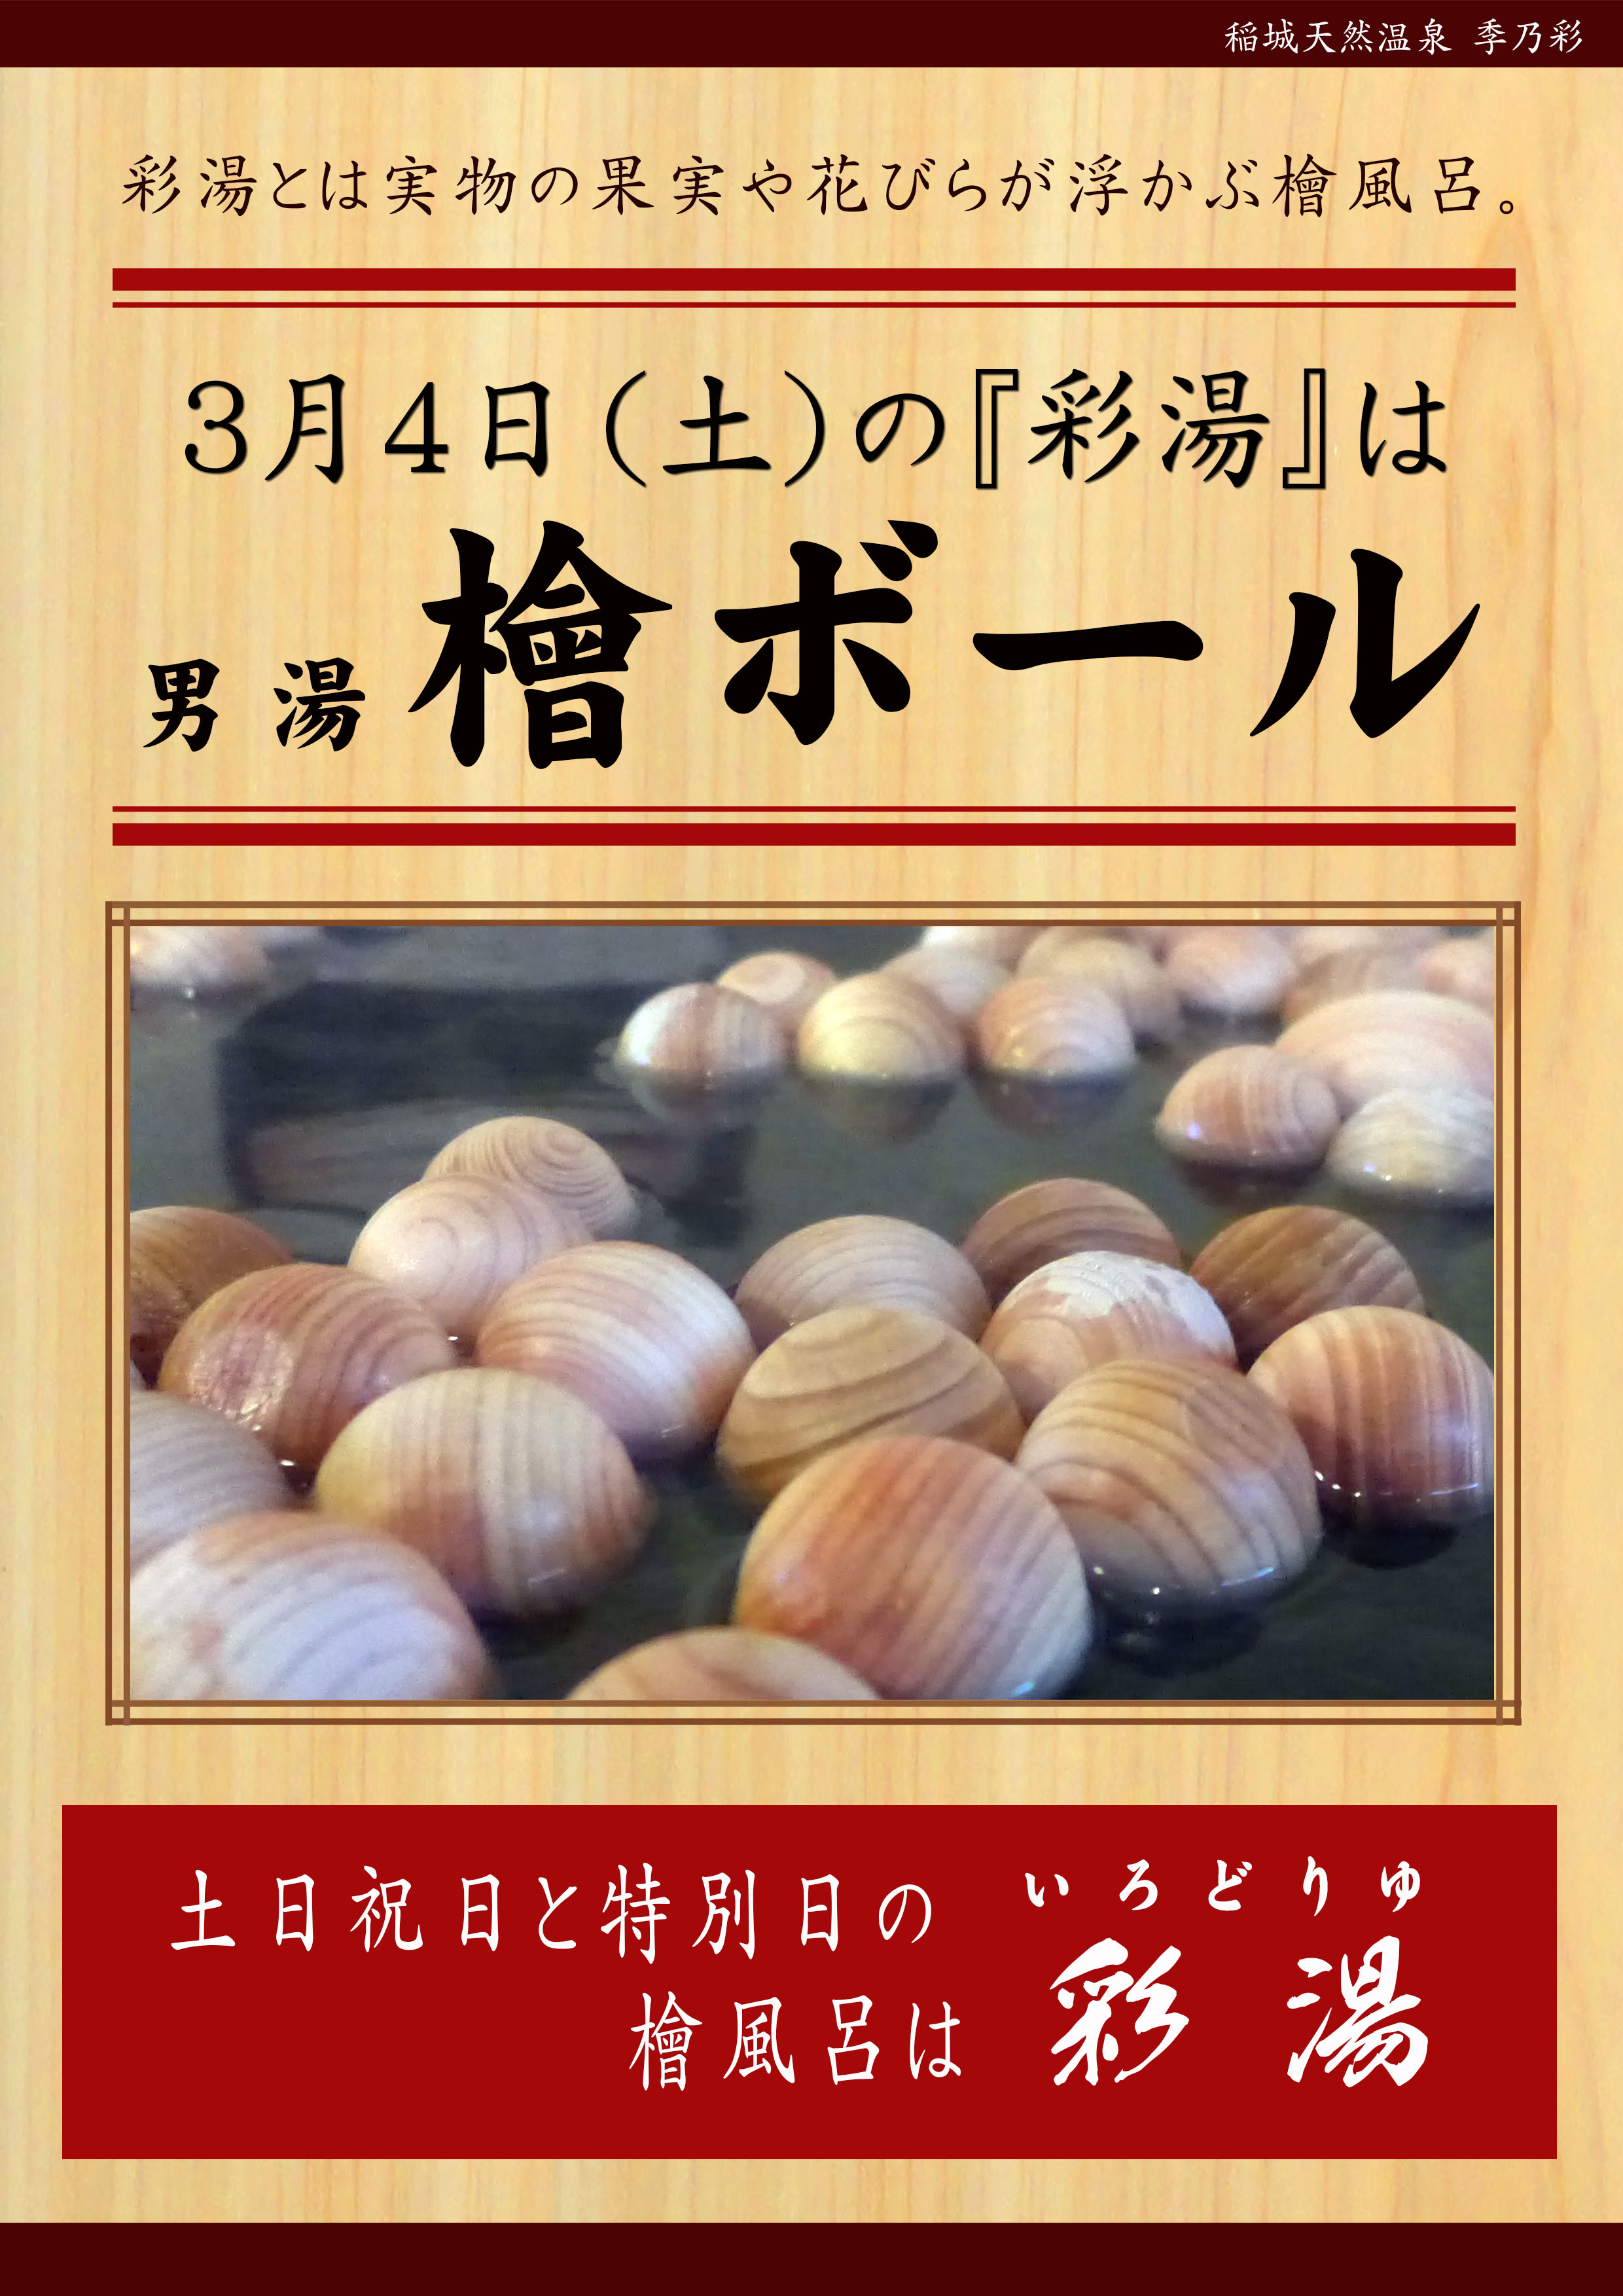 20170304POP イベント 彩湯 男湯 檜ボール